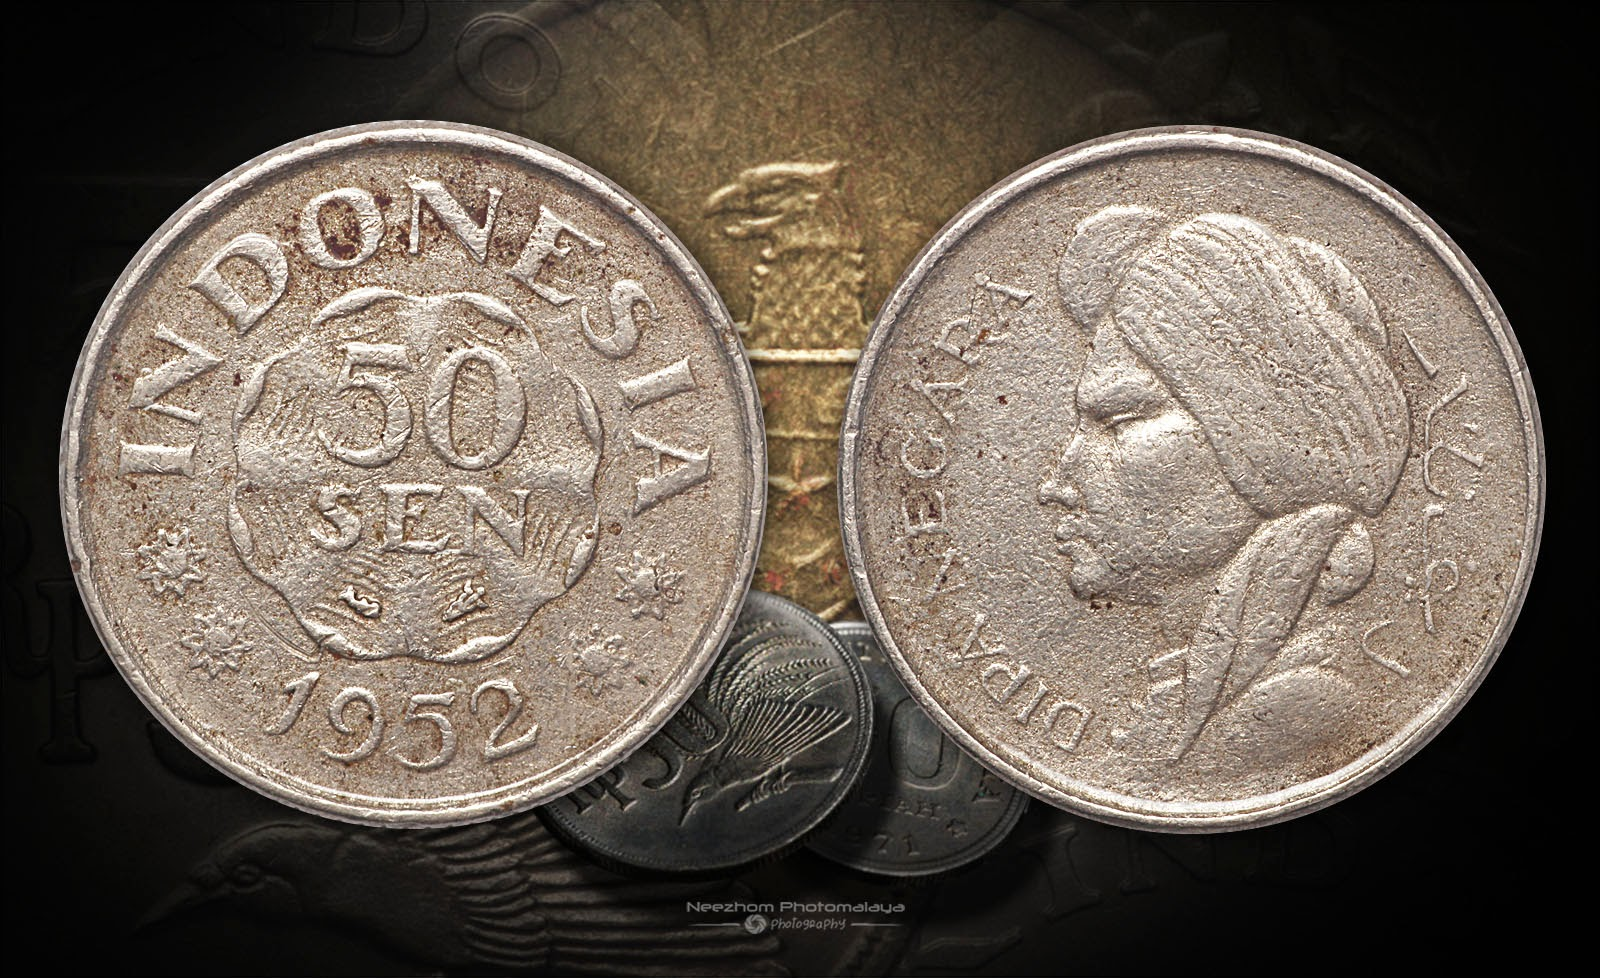 Indonesia old coin 50 Sen 1952